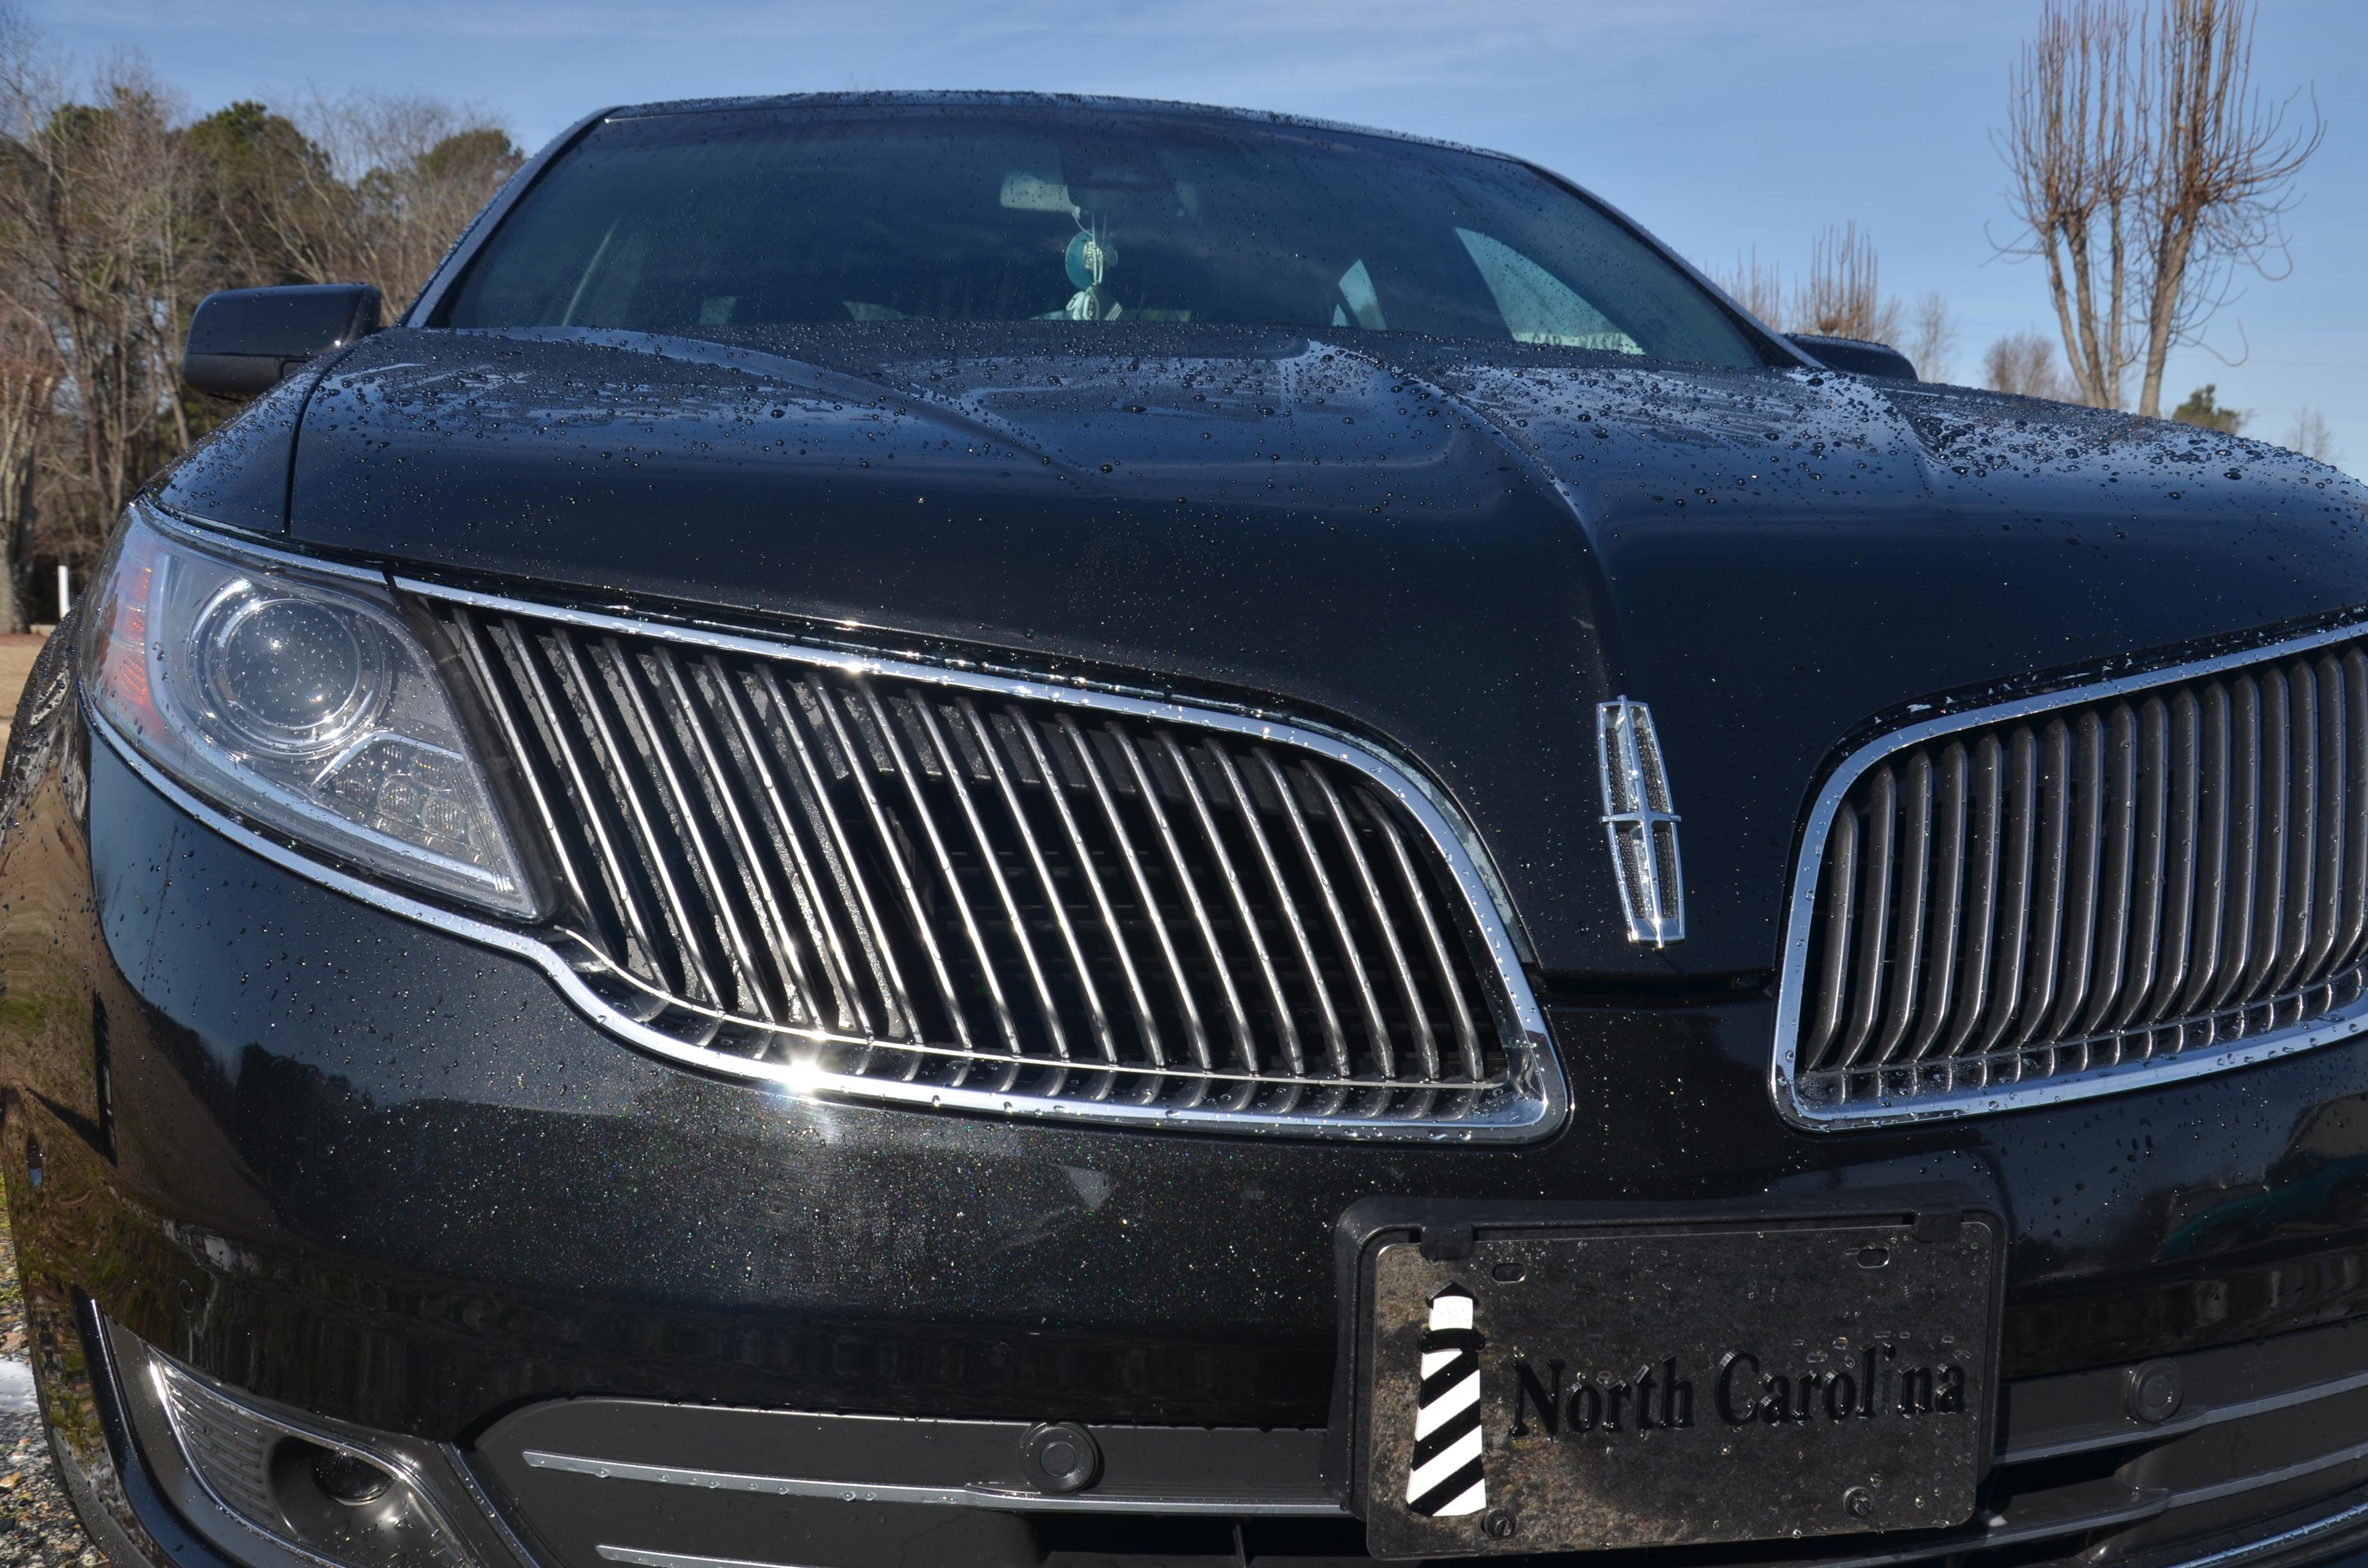 cgc vehicle kia of lumberton details infiniti auto finder